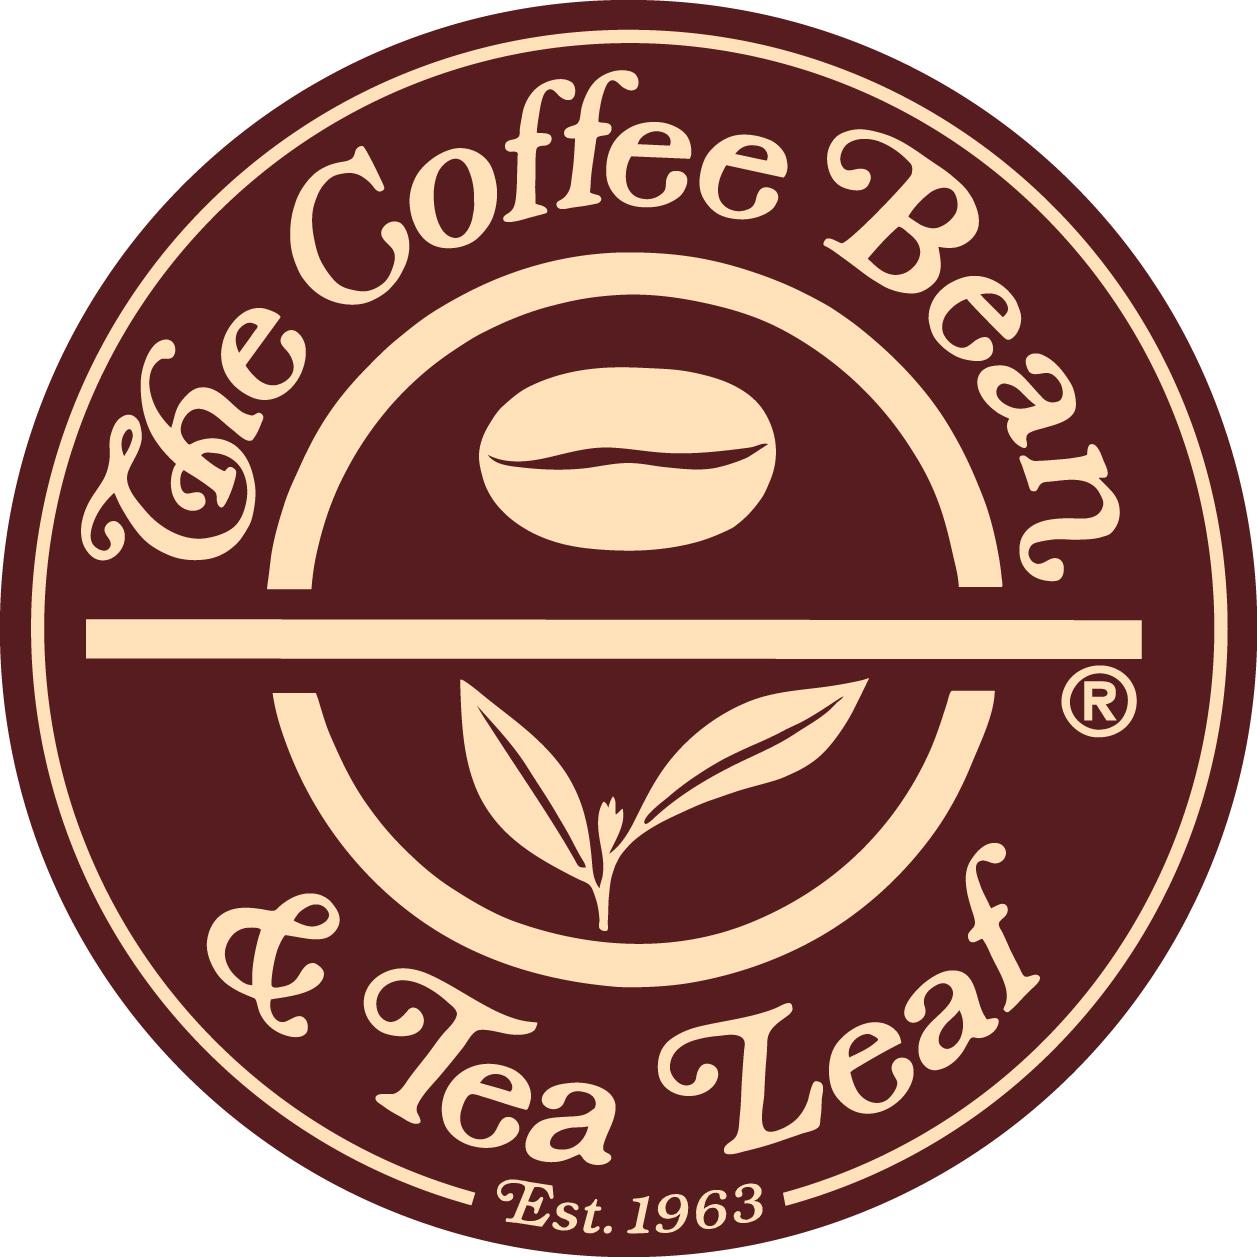 The-coffee-bean-and-tea-leaf-logo.jpg